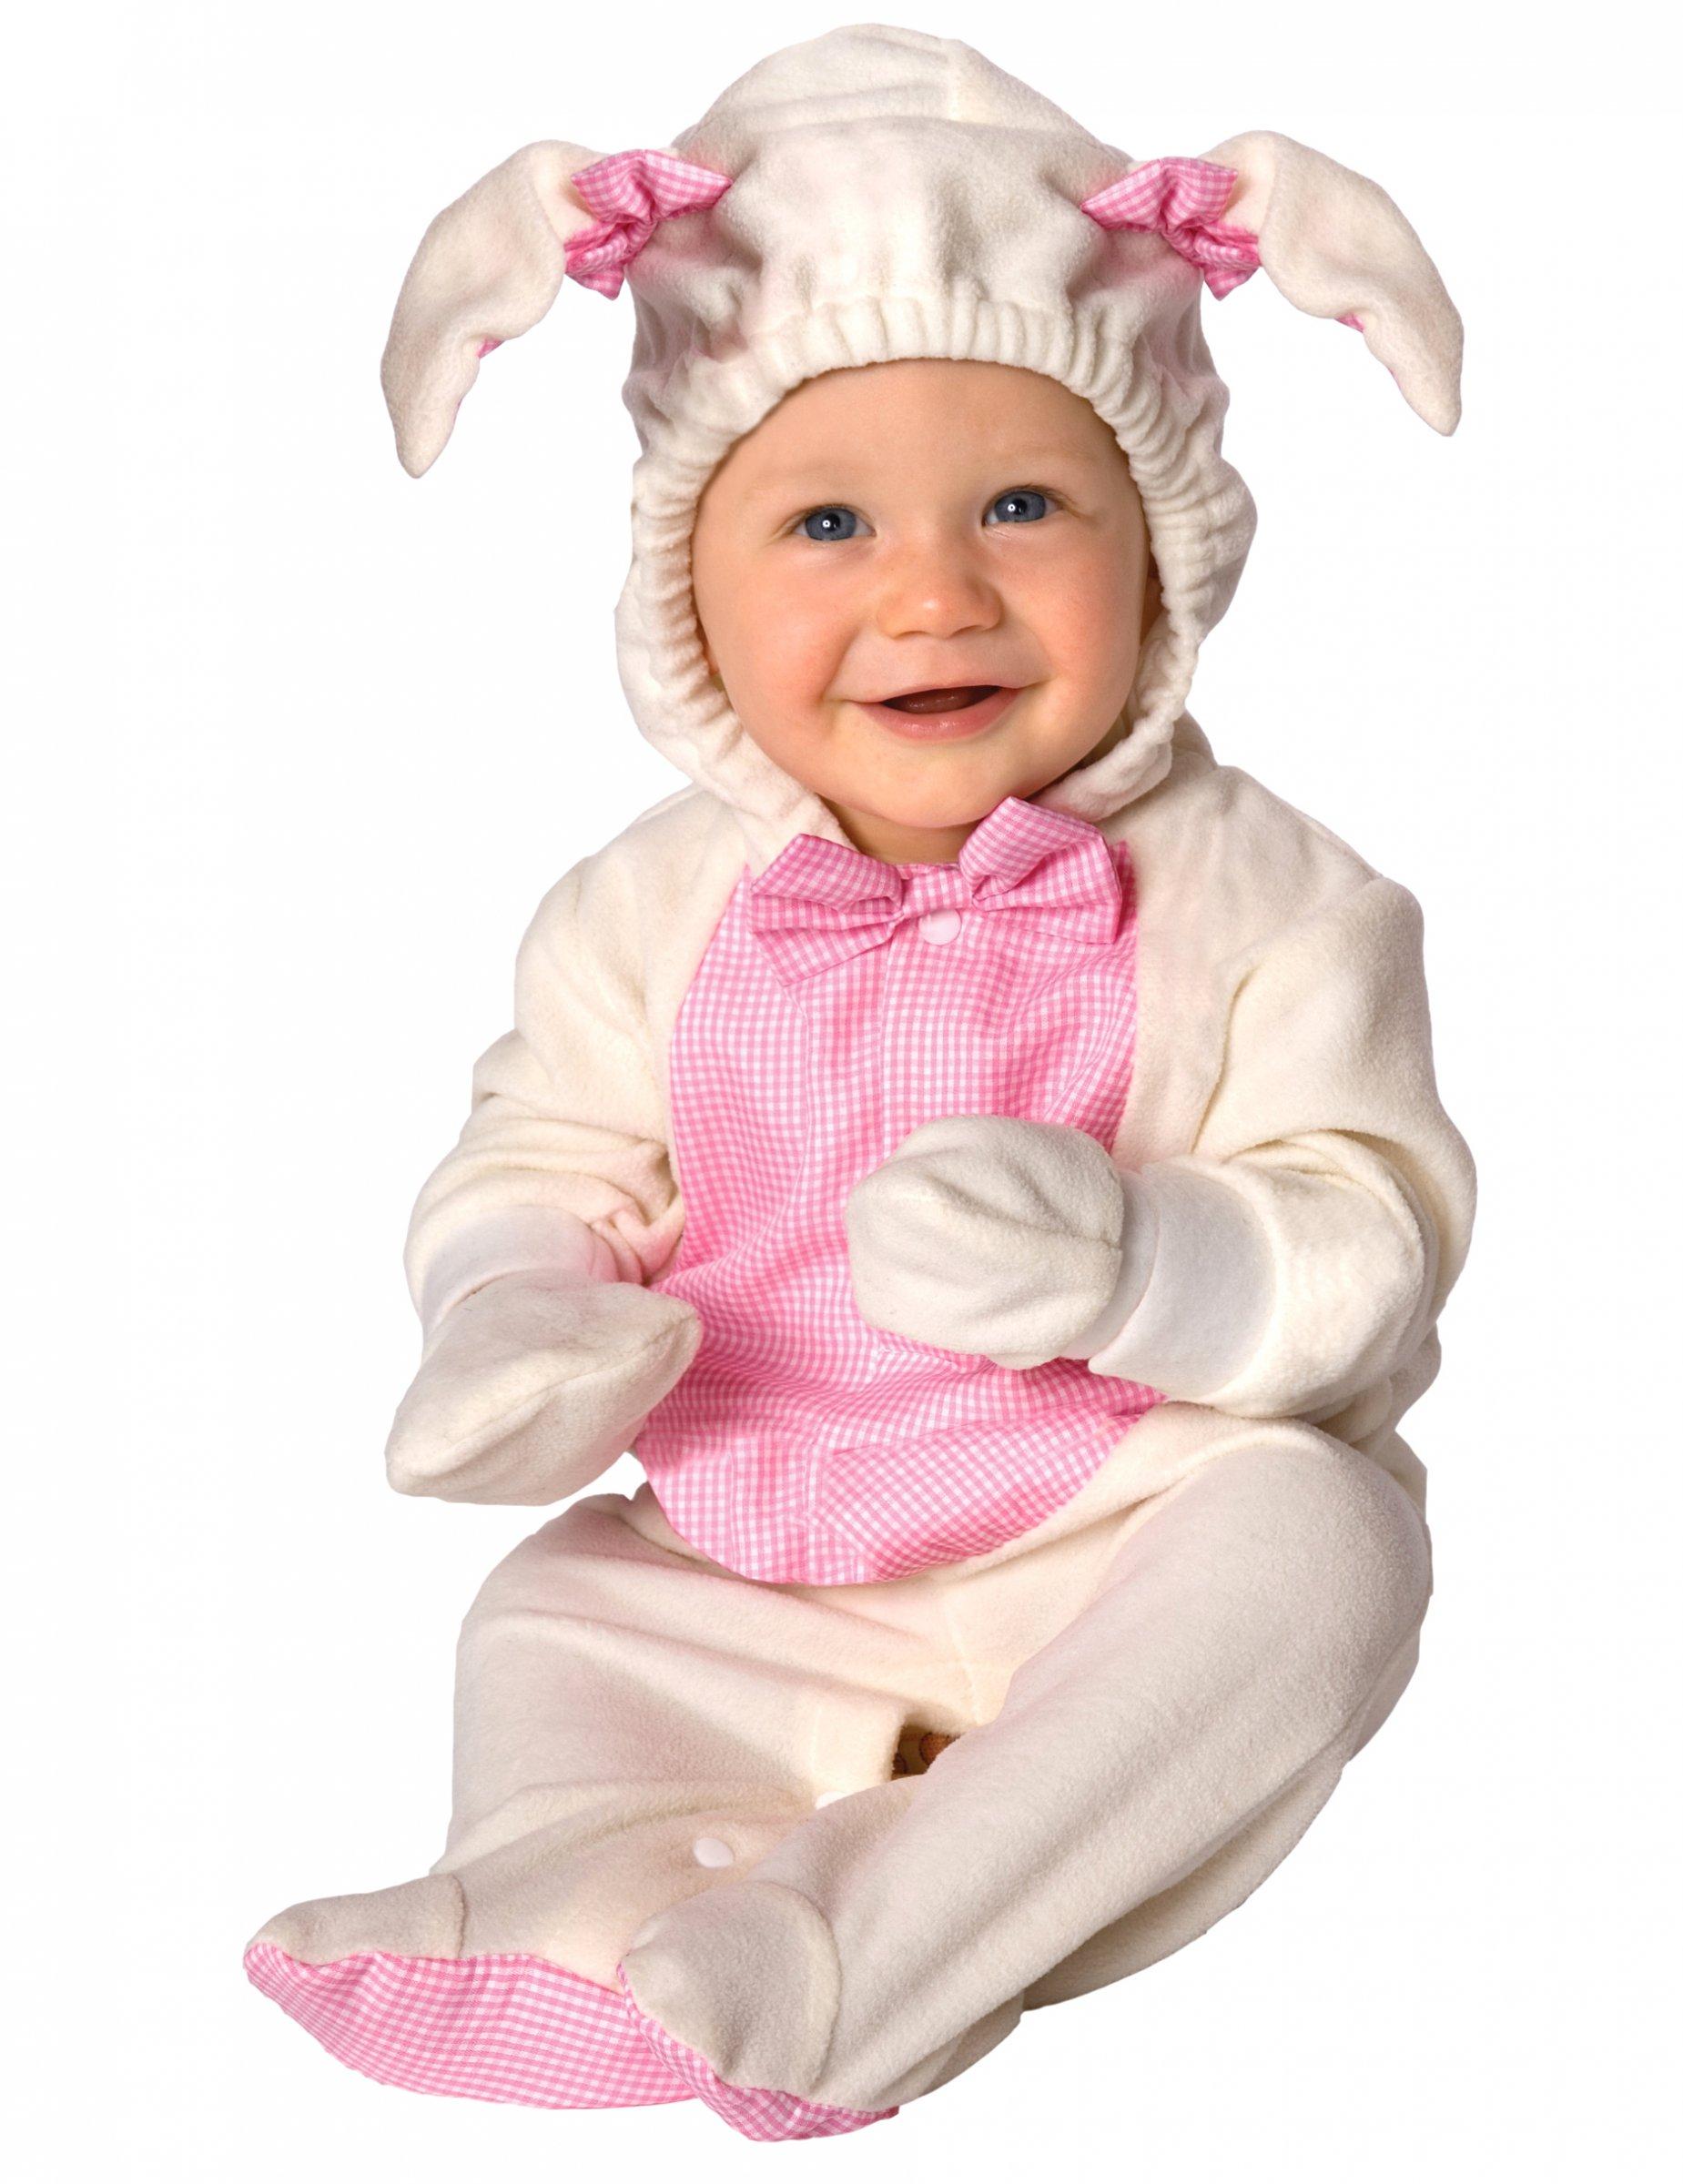 Susses Lamm Babykostum Schaf Weiss Rosa Gunstige Faschings Kostume